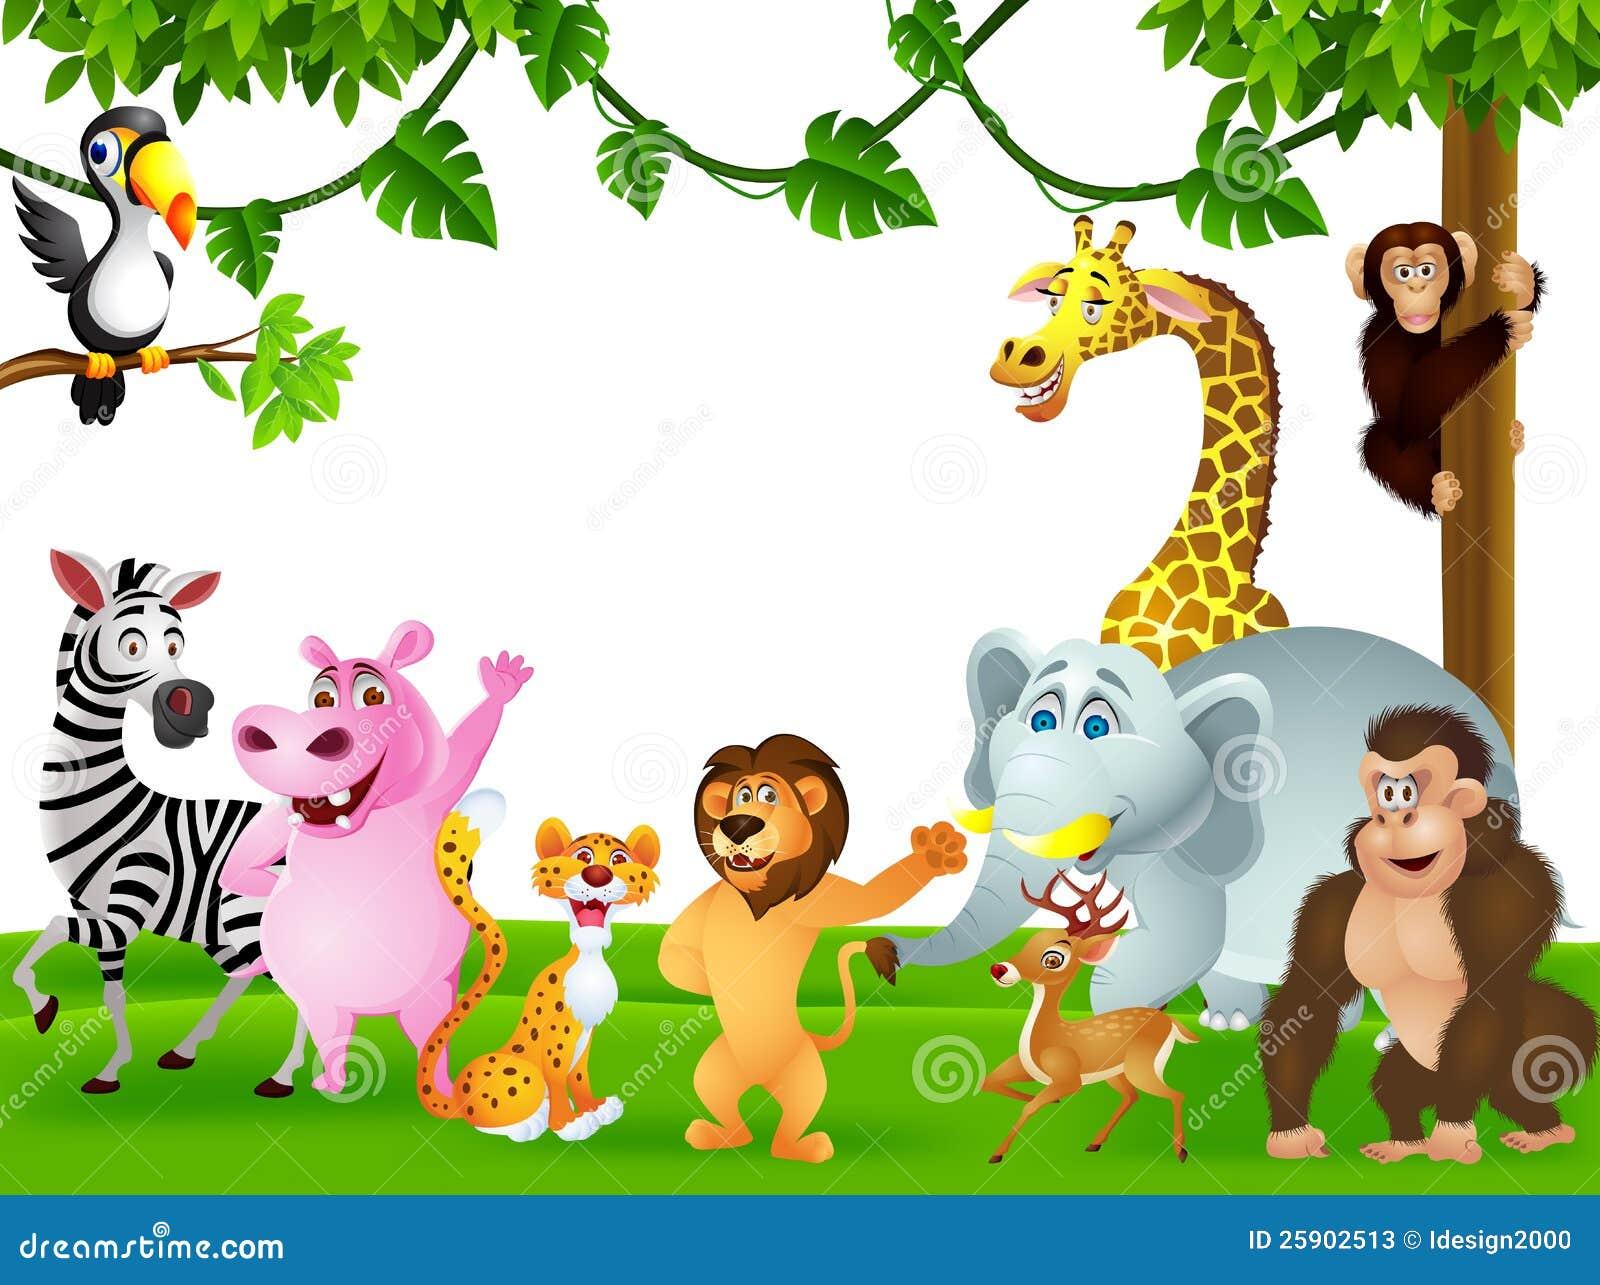 Funny Wild African Animal Cartoon Stock Vector